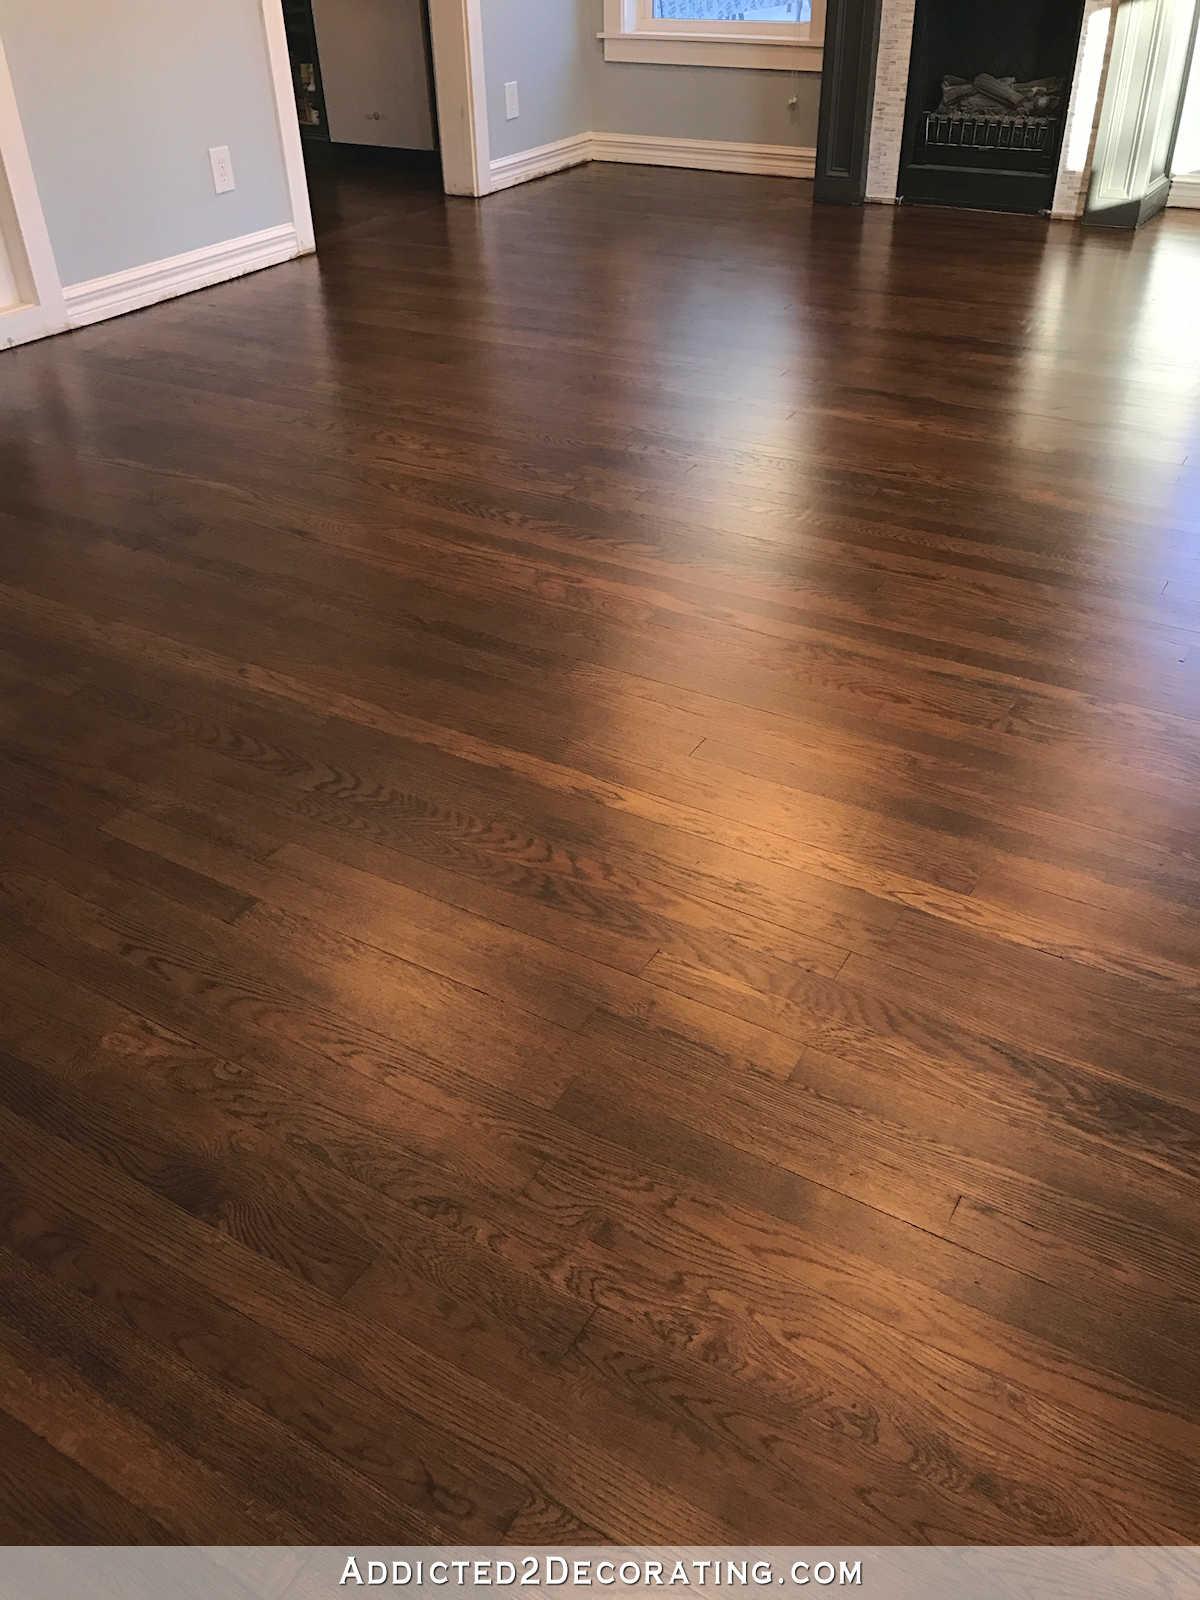 Red oak hardwood flooring refinished red oak hardwood floors - entryway and living room PKPQYNJ